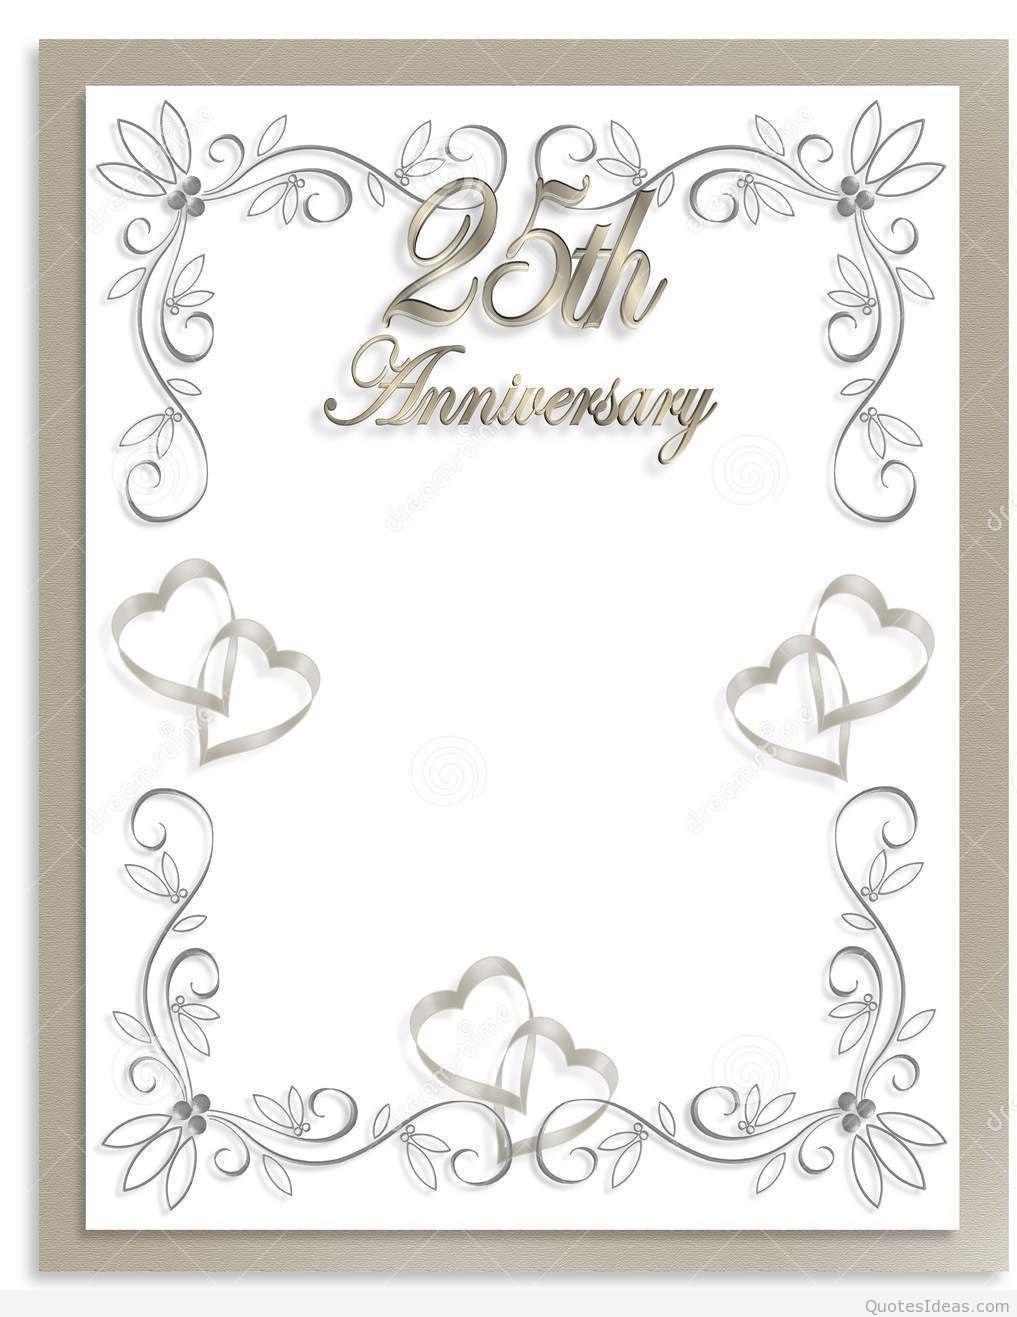 Free Silver Wedding Anniversary Invitations Templates  Templates In Template For Anniversary Card